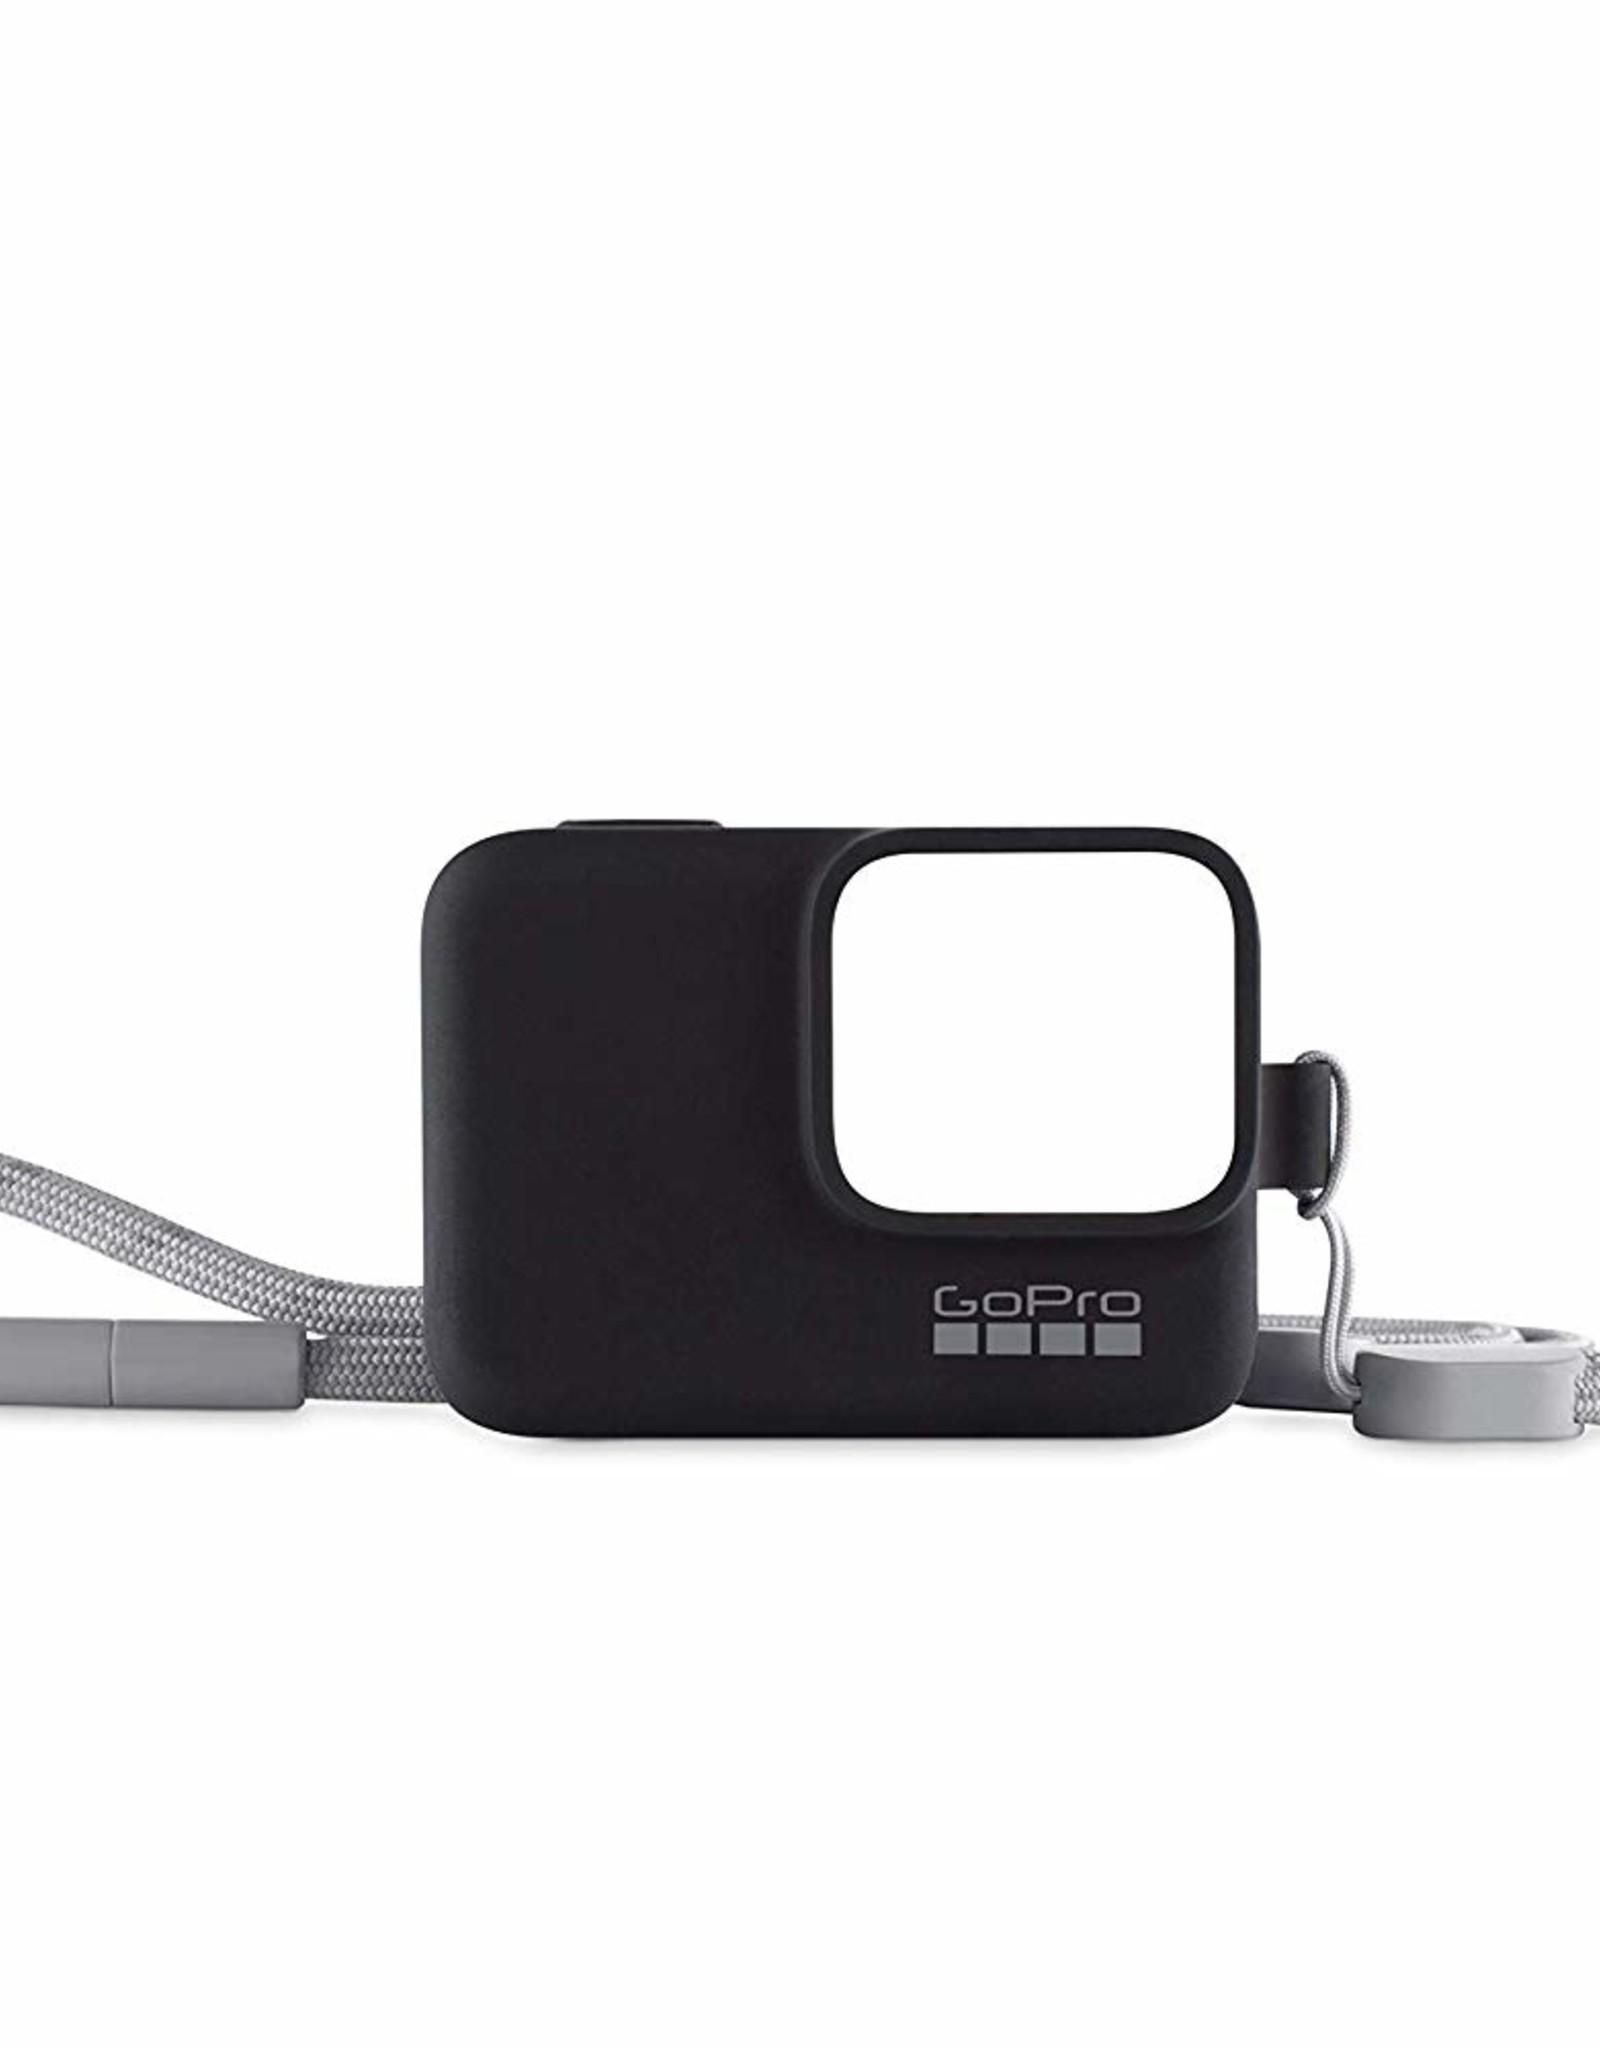 GoPro GoPro Sleeve + Lanyard (Black) GP-ACSST-001